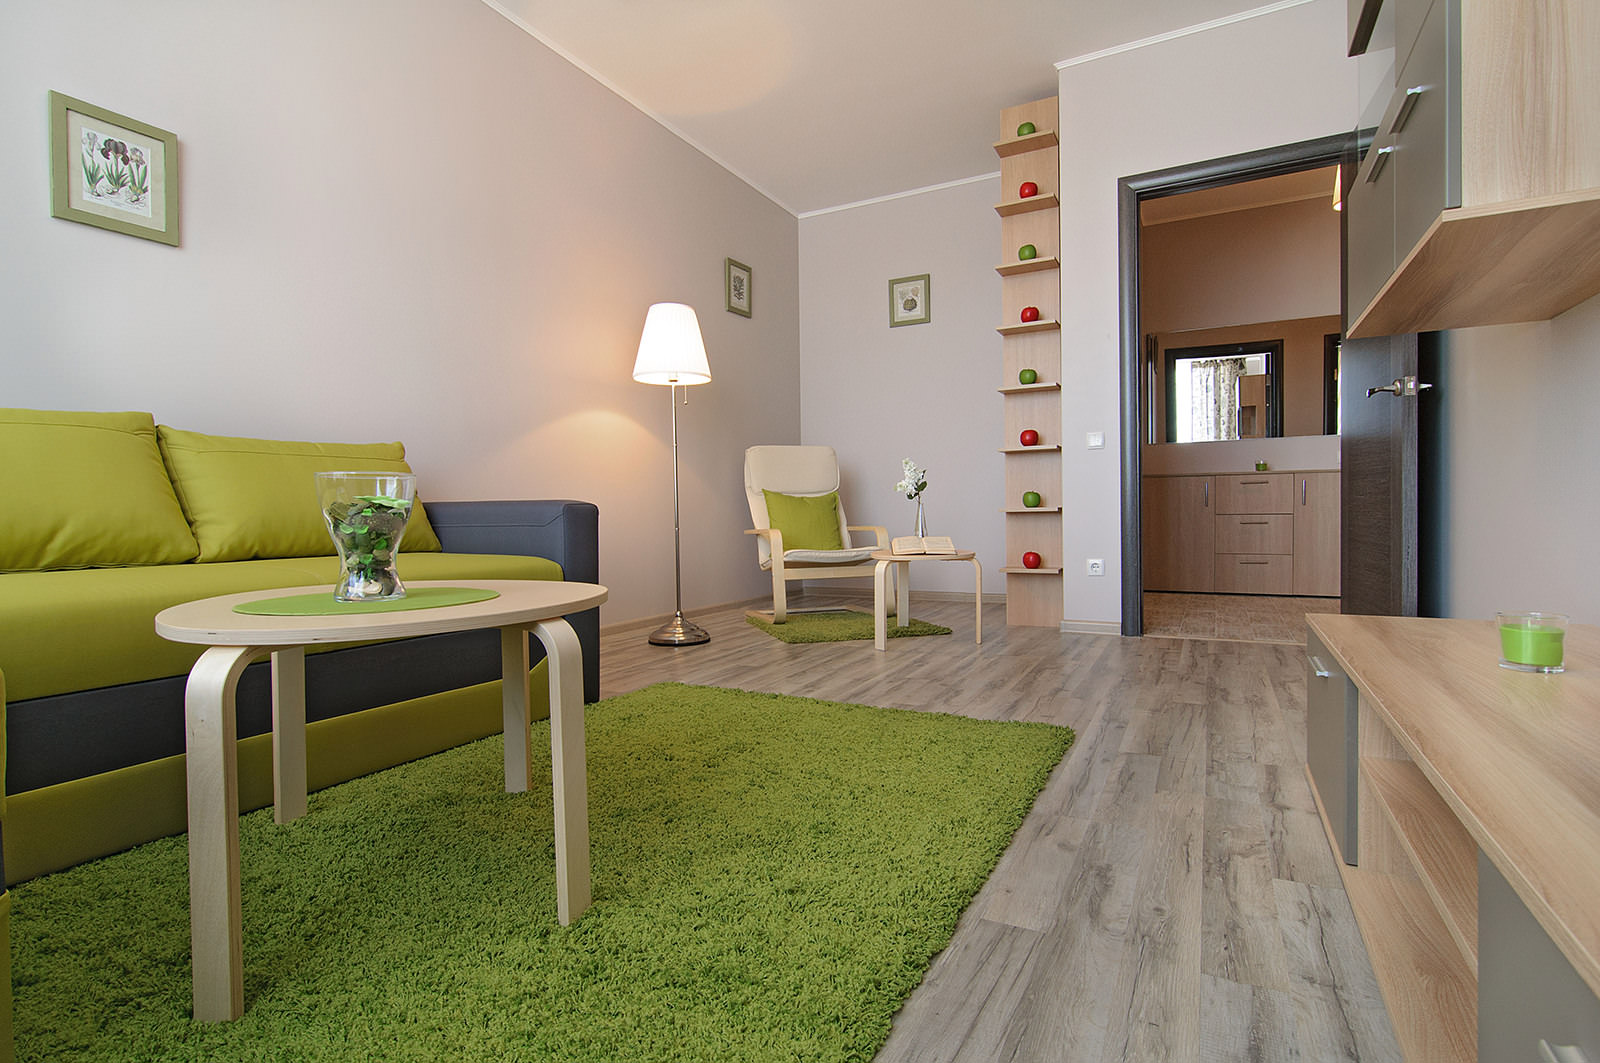 ednostaen-apartament-s-moderen-i-uiuten-interior-42-m-2g